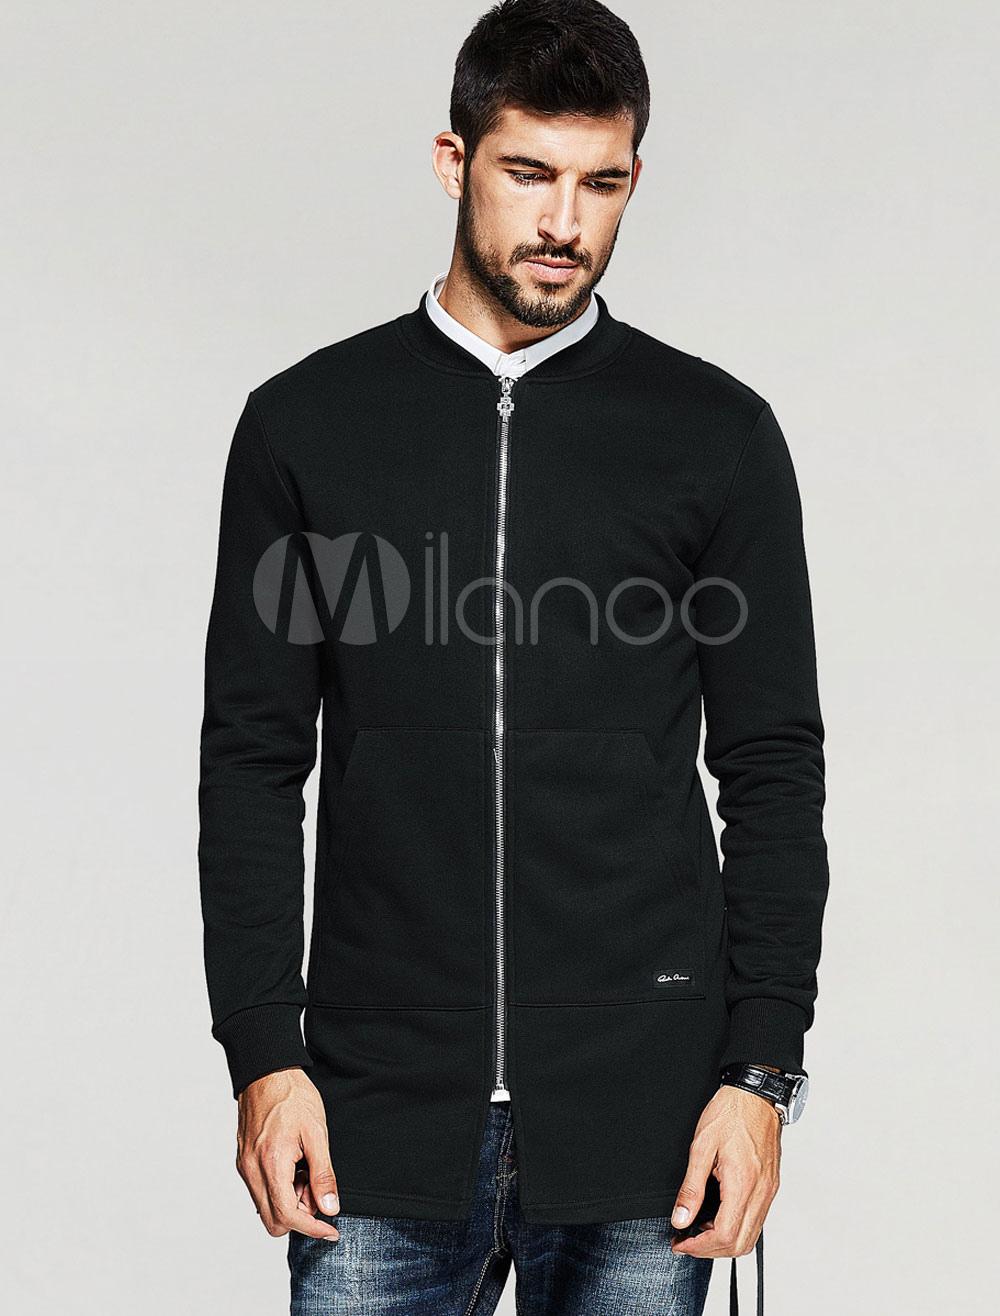 Men's Black Jackets Stand Collar Long Sleeve Zip Up Slim Fit Jacket thumbnail